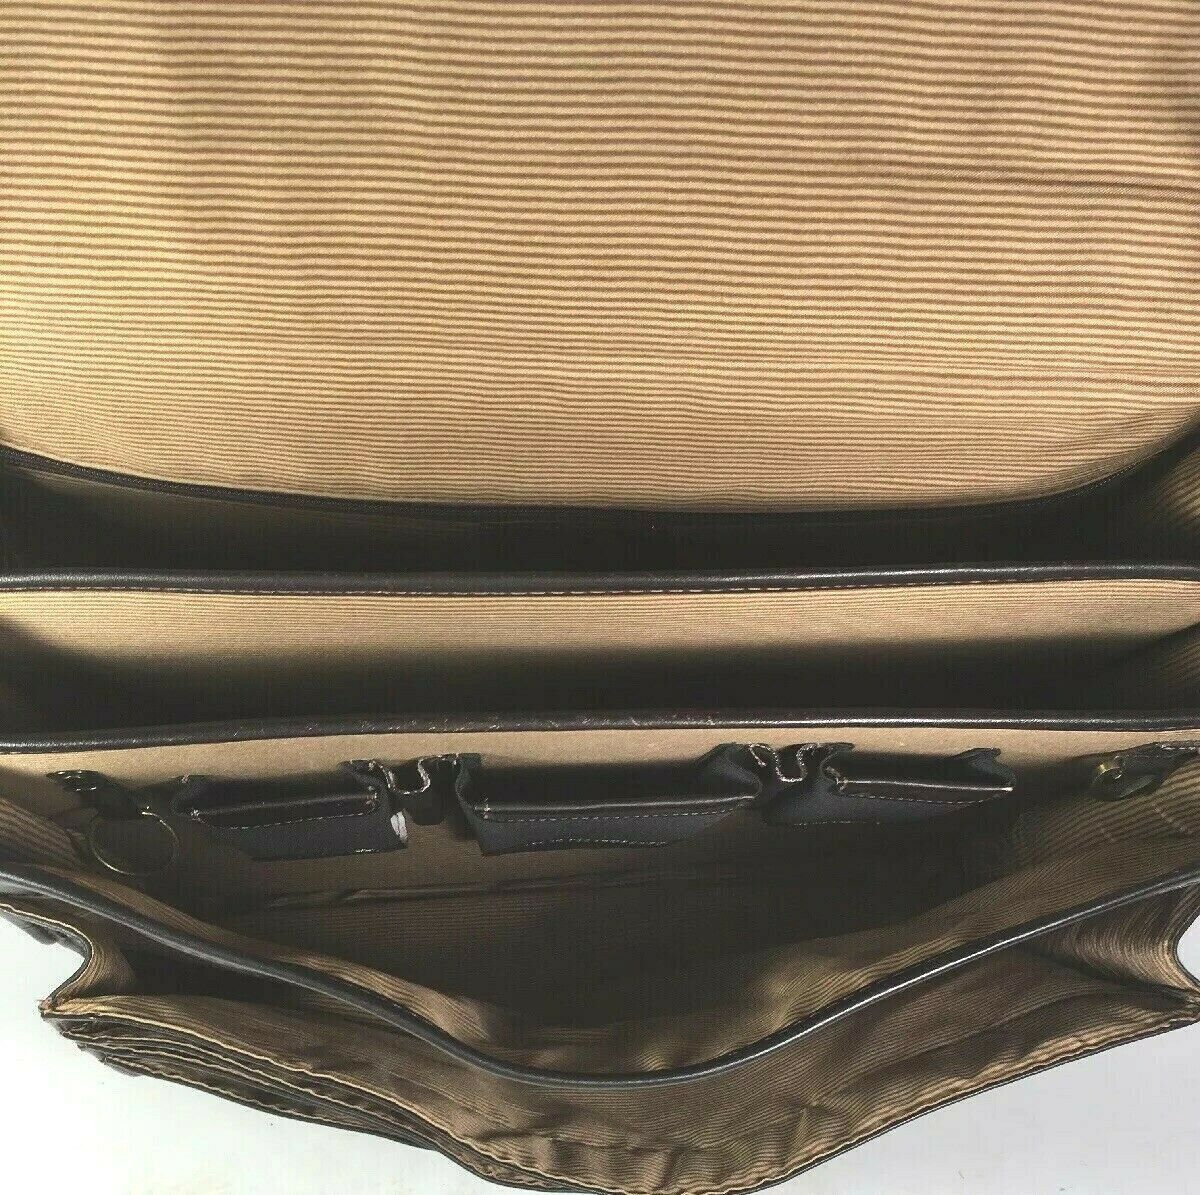 Santa Fe Dilana Vintage Dark Brown Leather Briefcase Laptop Bag – Distressed image 8